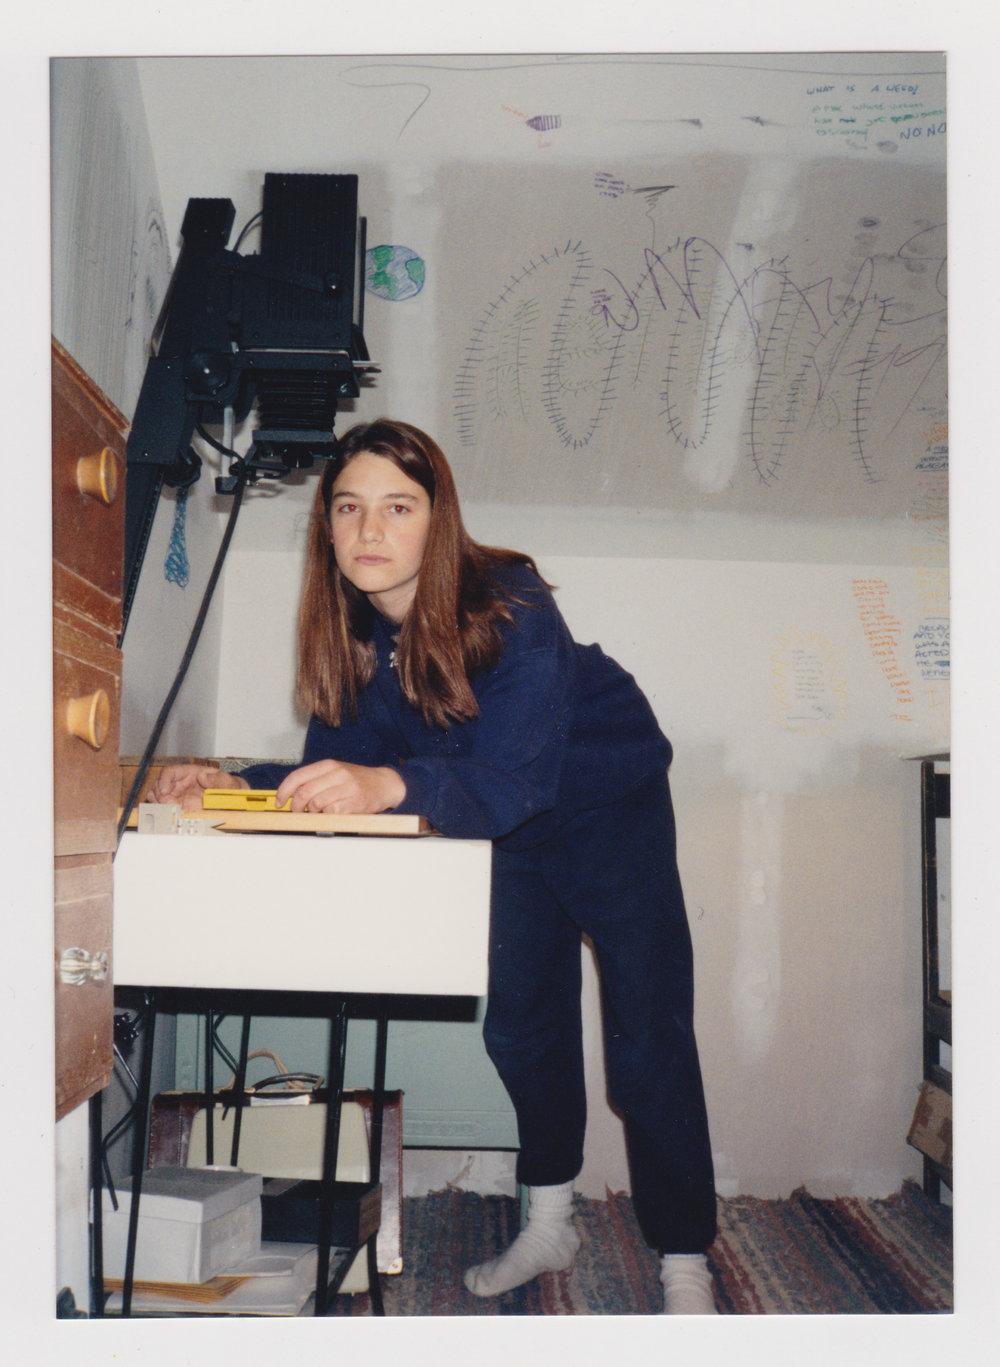 First darkroom, circa 1993, Santa Fe, NM